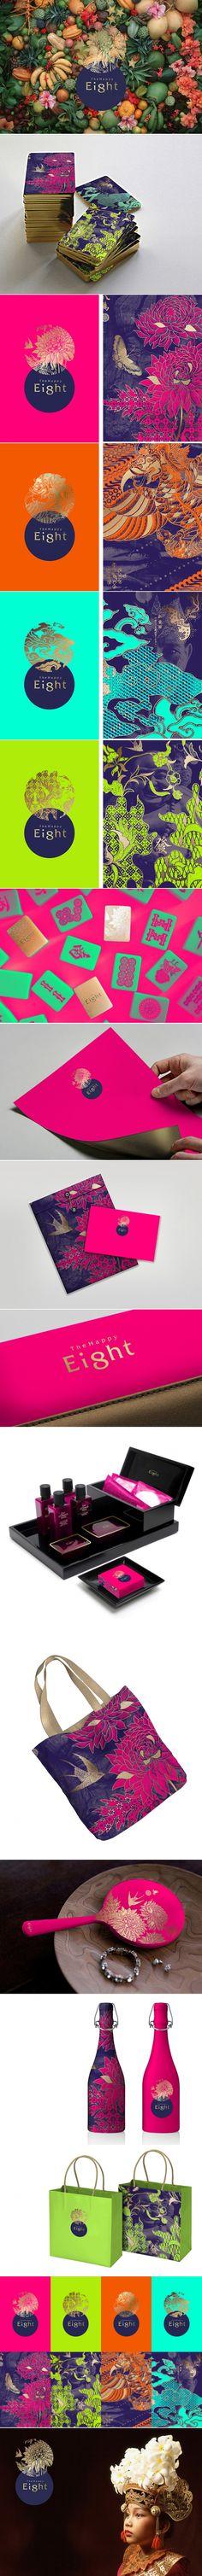 The Happy Eight Hotel Branding — The Dieline - Branding & Packaging Design